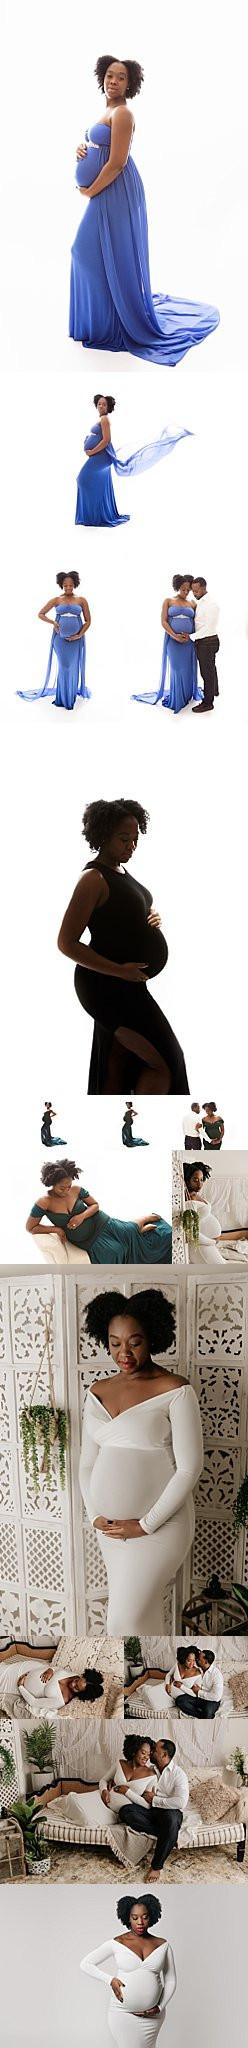 NJ Maternity photographer